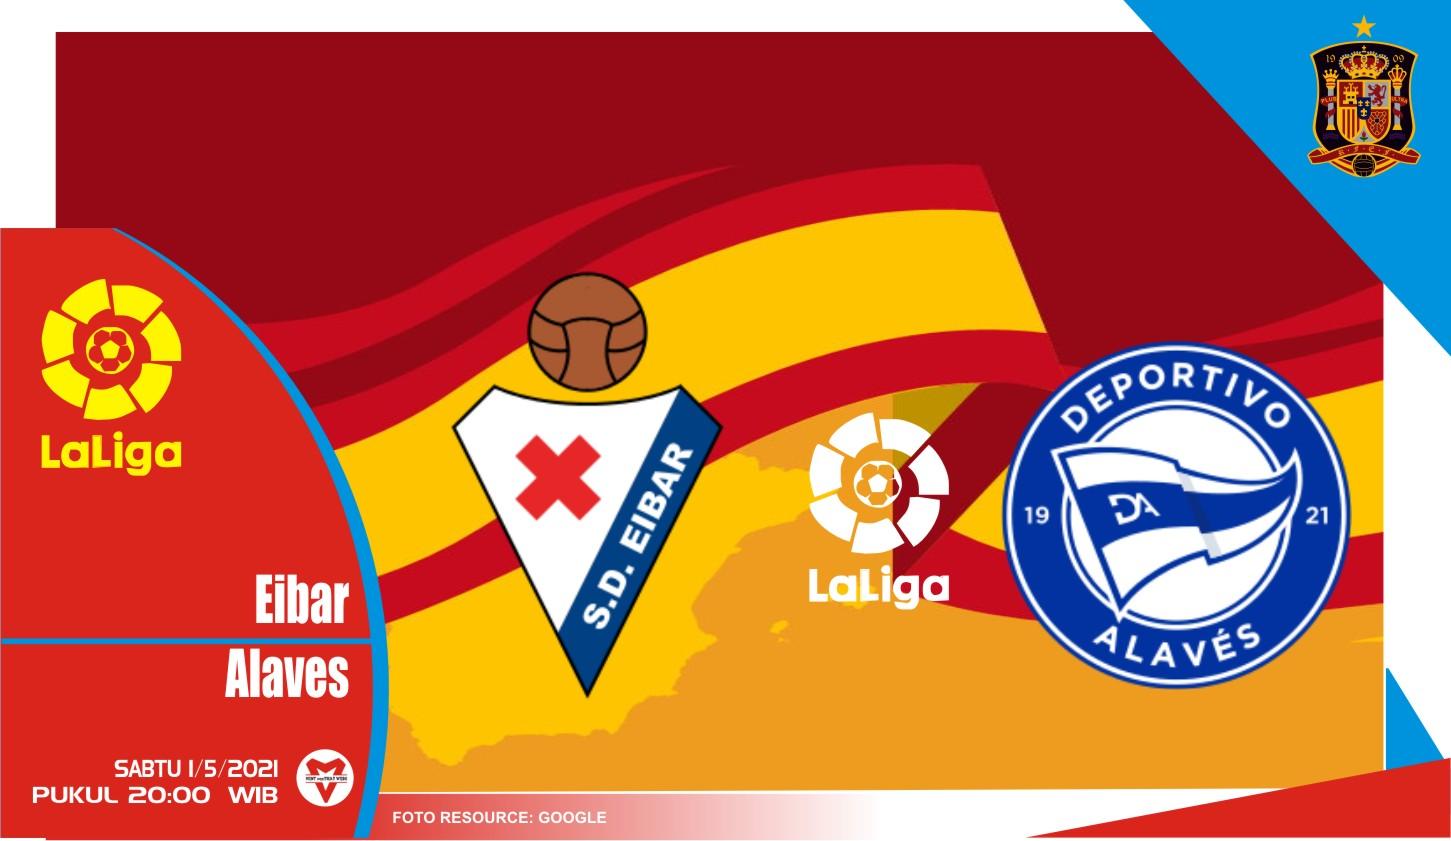 Prediksi Liga Spanyol: Eibar vs Alaves - 1 Mei 2021